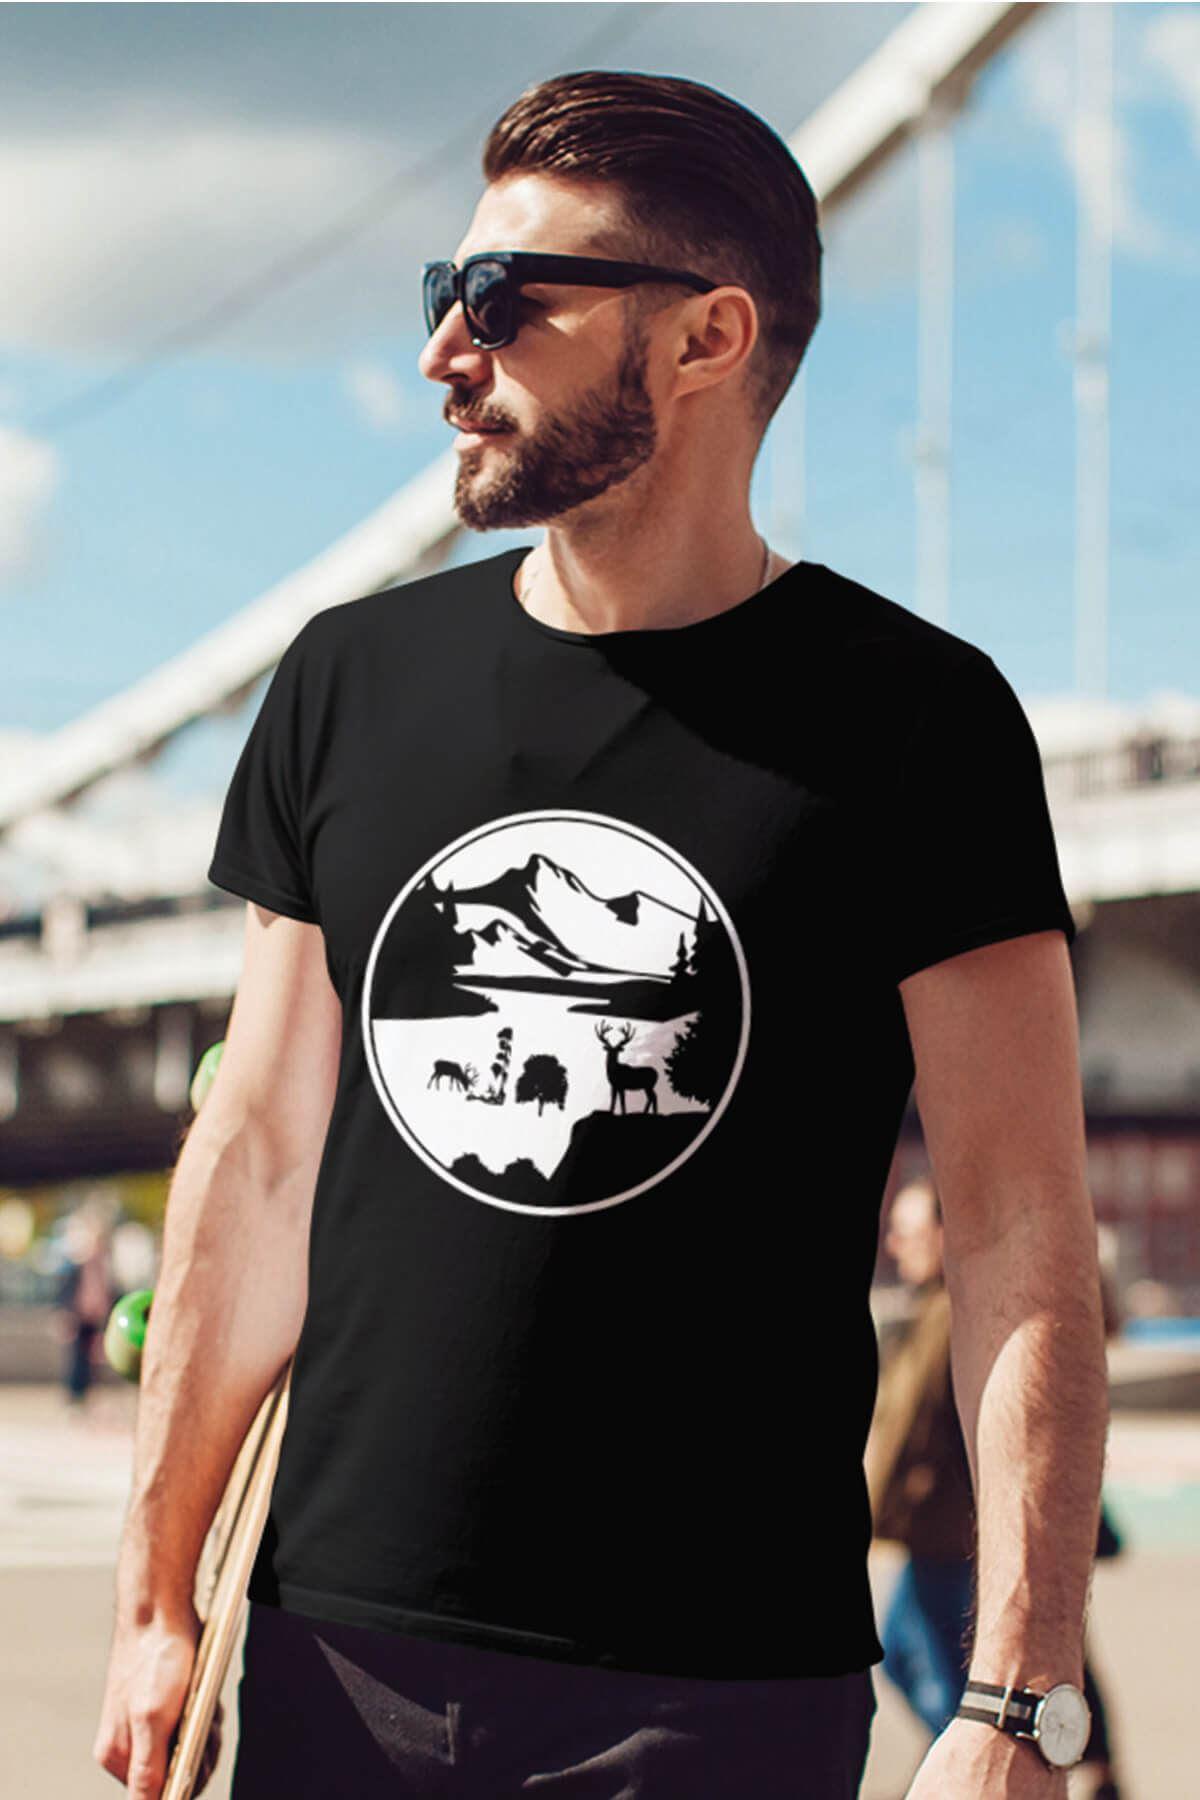 View Siyah Outdoor Erkek Tshirt - Tişört